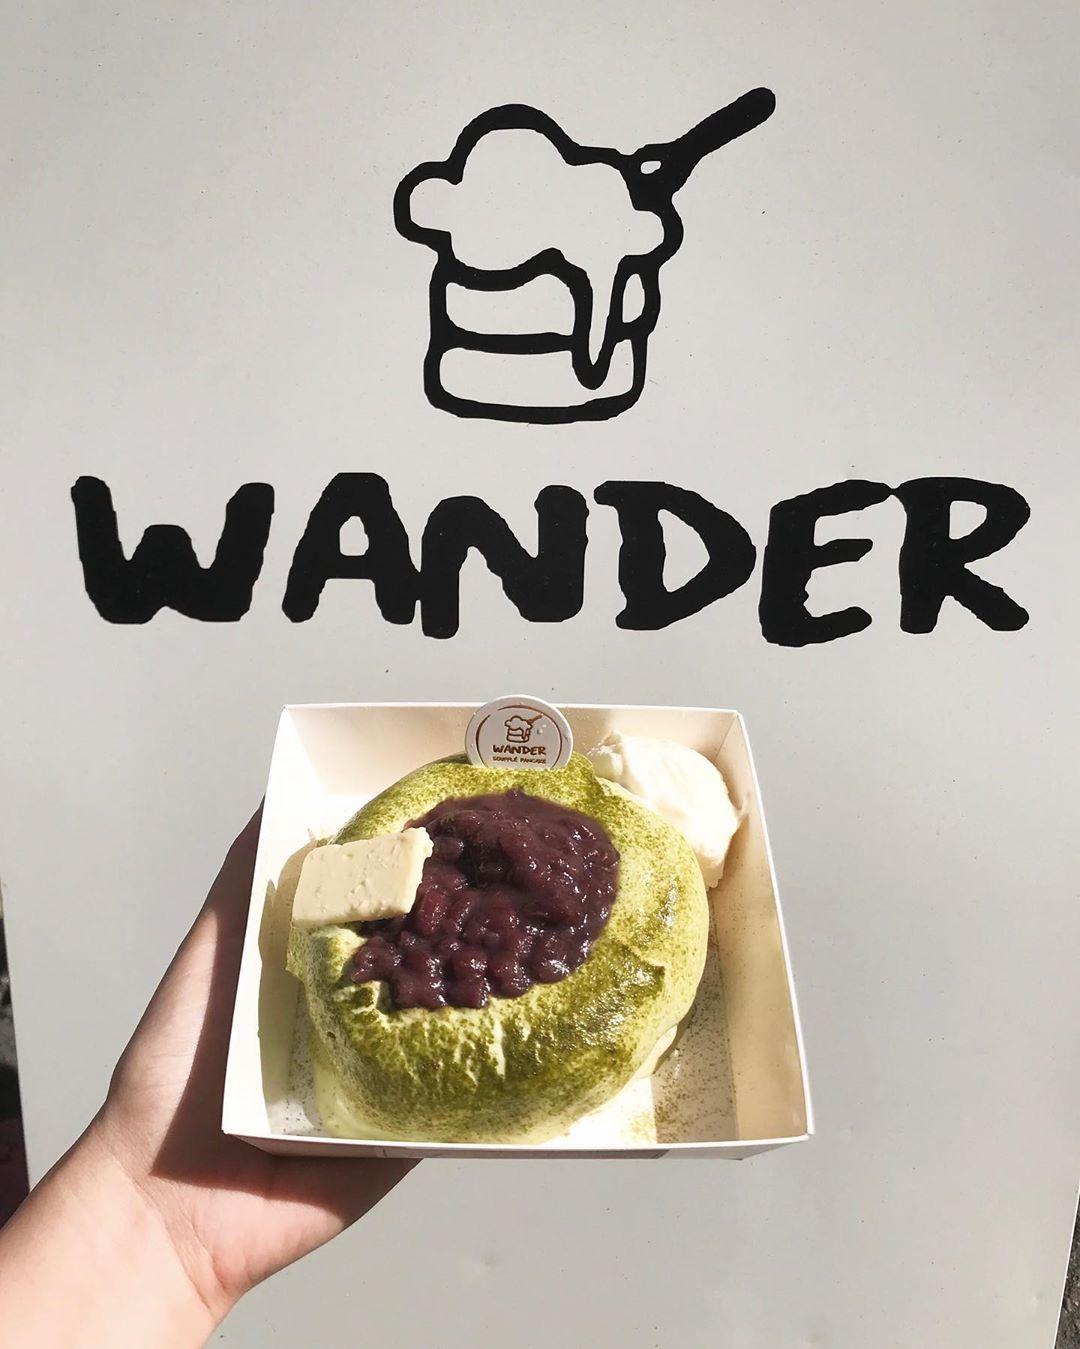 Wander soufflé pancake 漫步舒芙蕾鬆餅